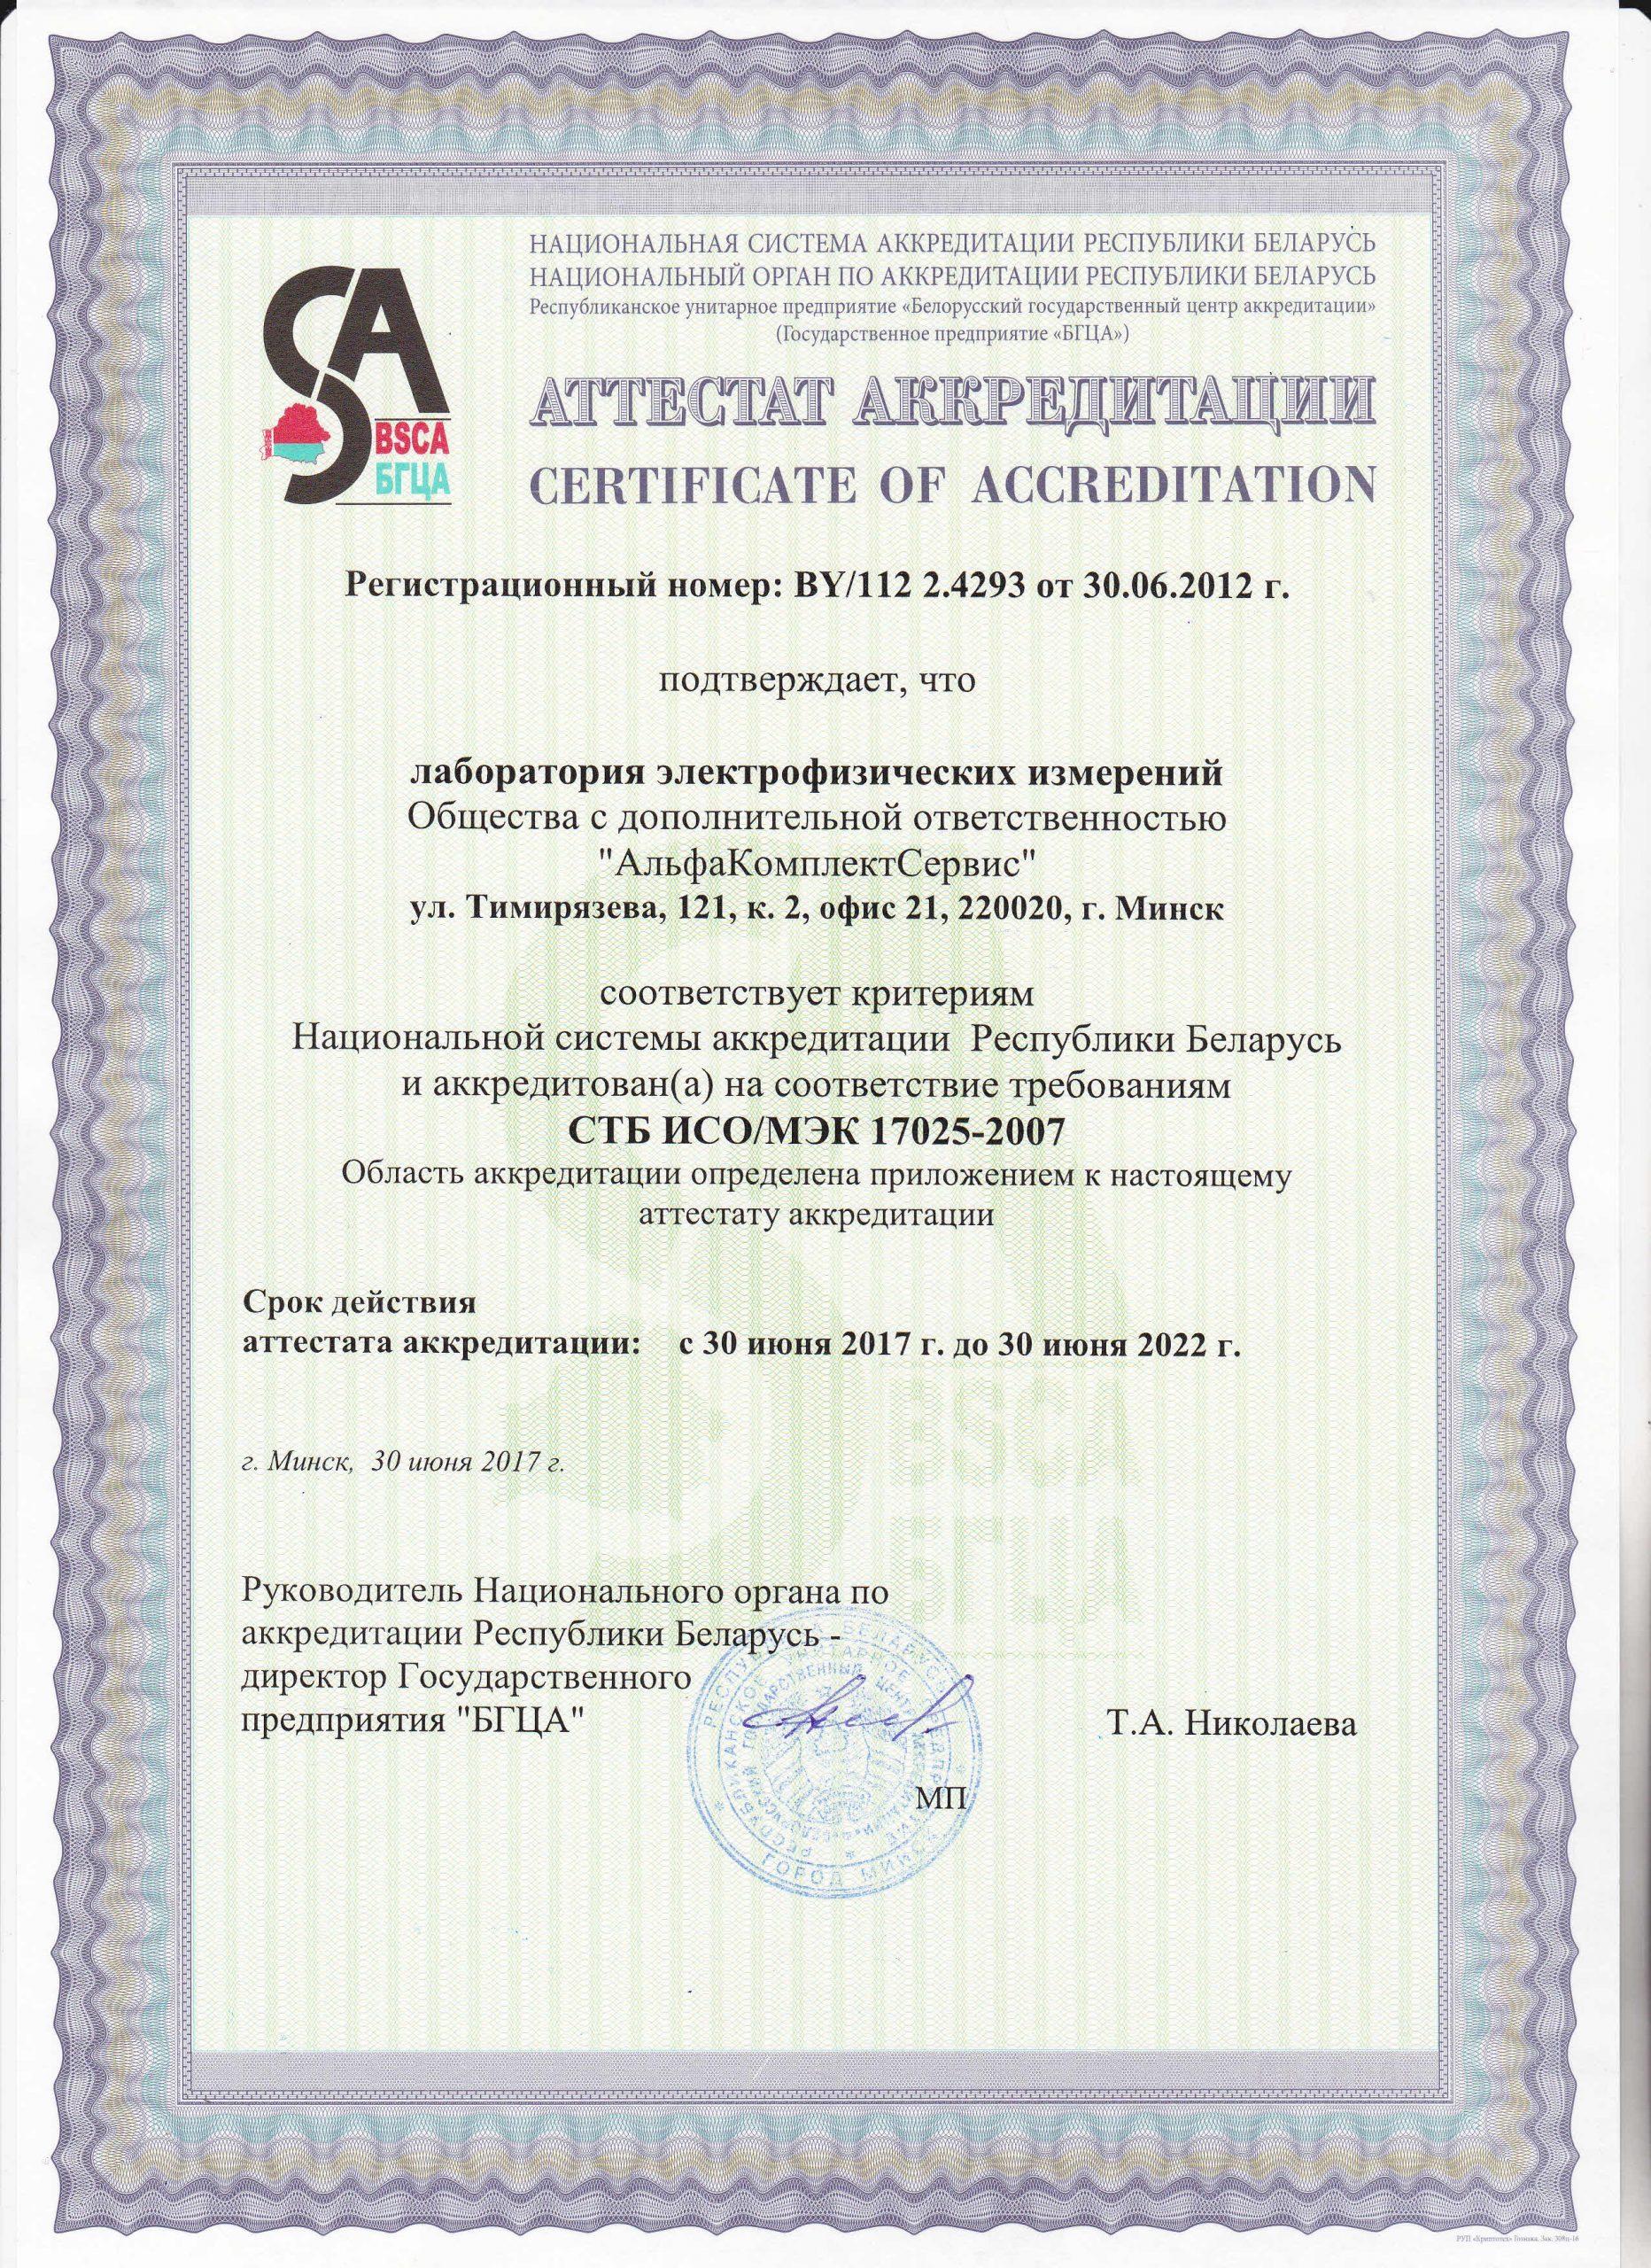 Аттестат (сертификат) аккредитации - СТБ ИСО МЭК 17025